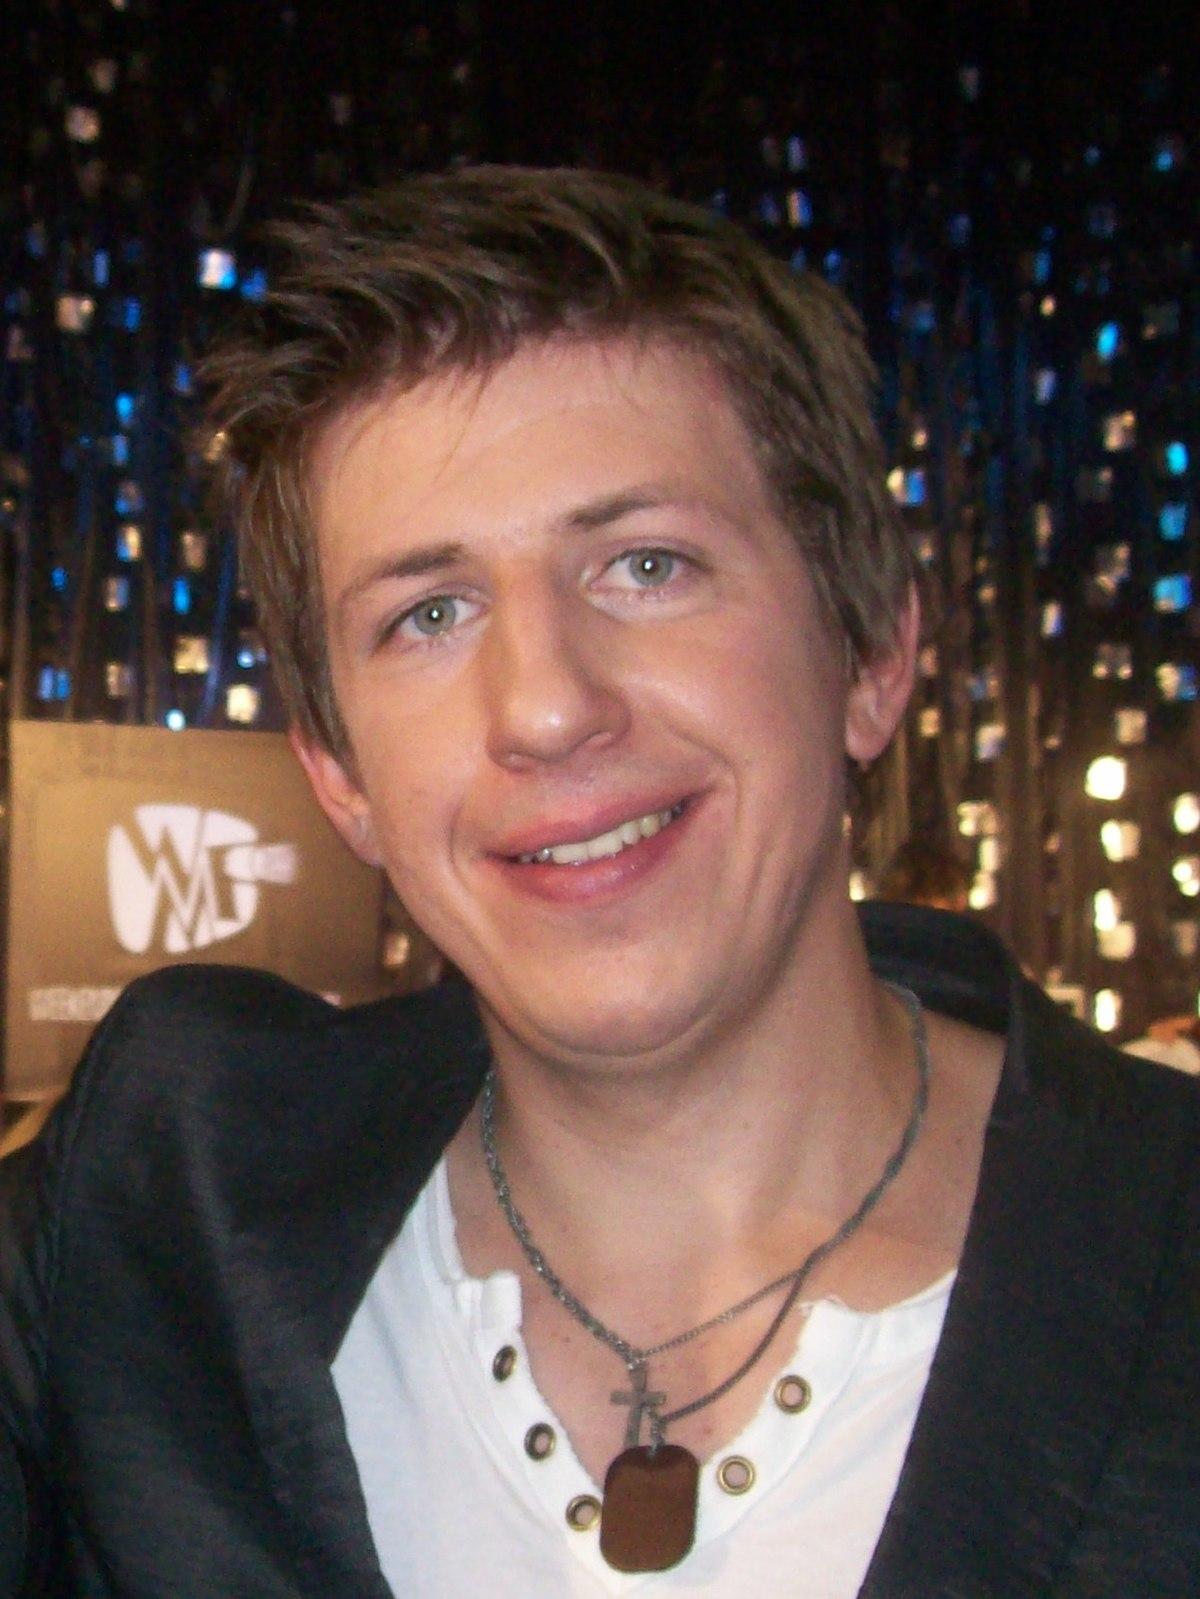 File Michal Karpacki Jpg Wikimedia Commons